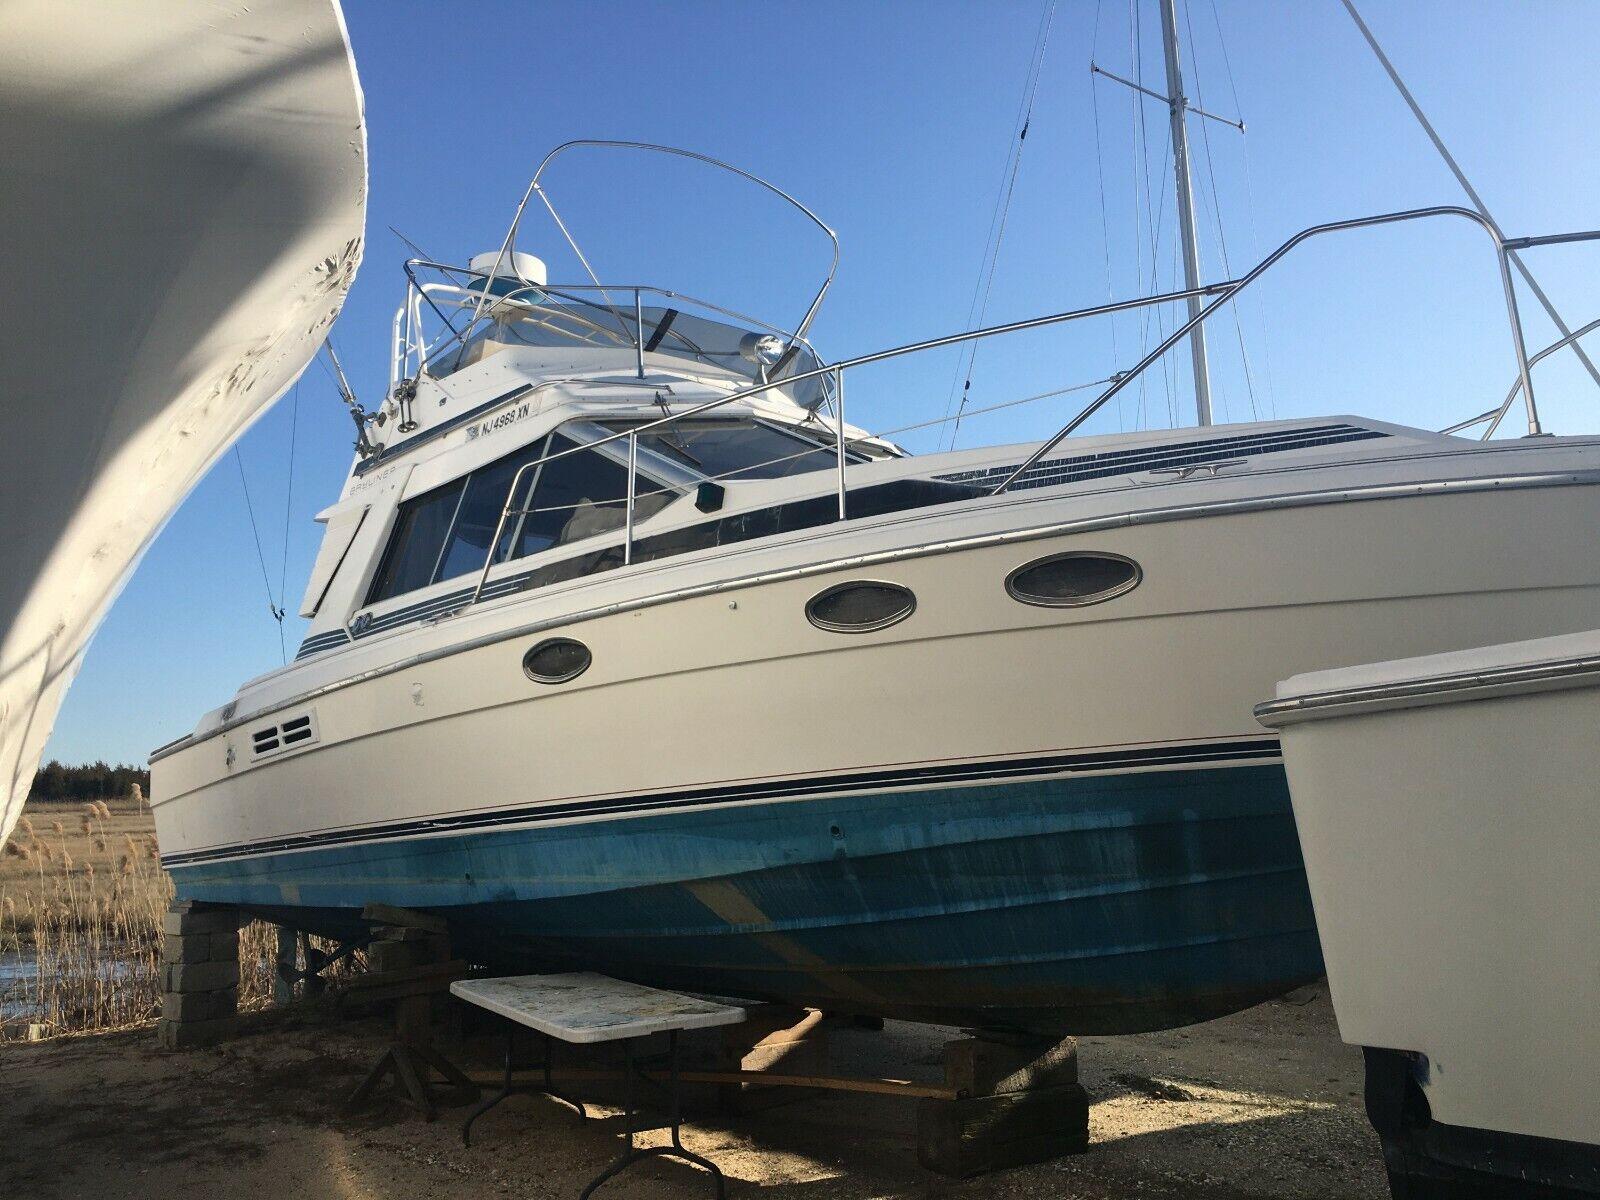 1987 Bayliner Pisces 34' Cabin Cruiser - New Jersey